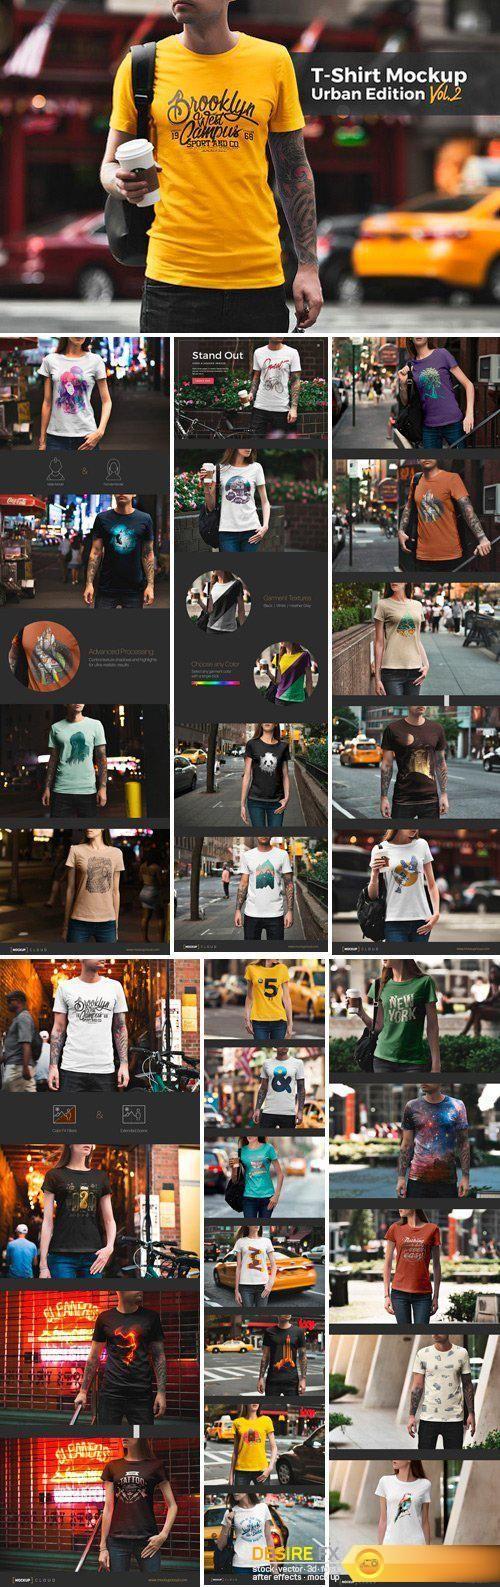 Download Cm T Shirt Mockup Urban Edition 1664349 Tshirt Mockup Shirt Mockup Mockup